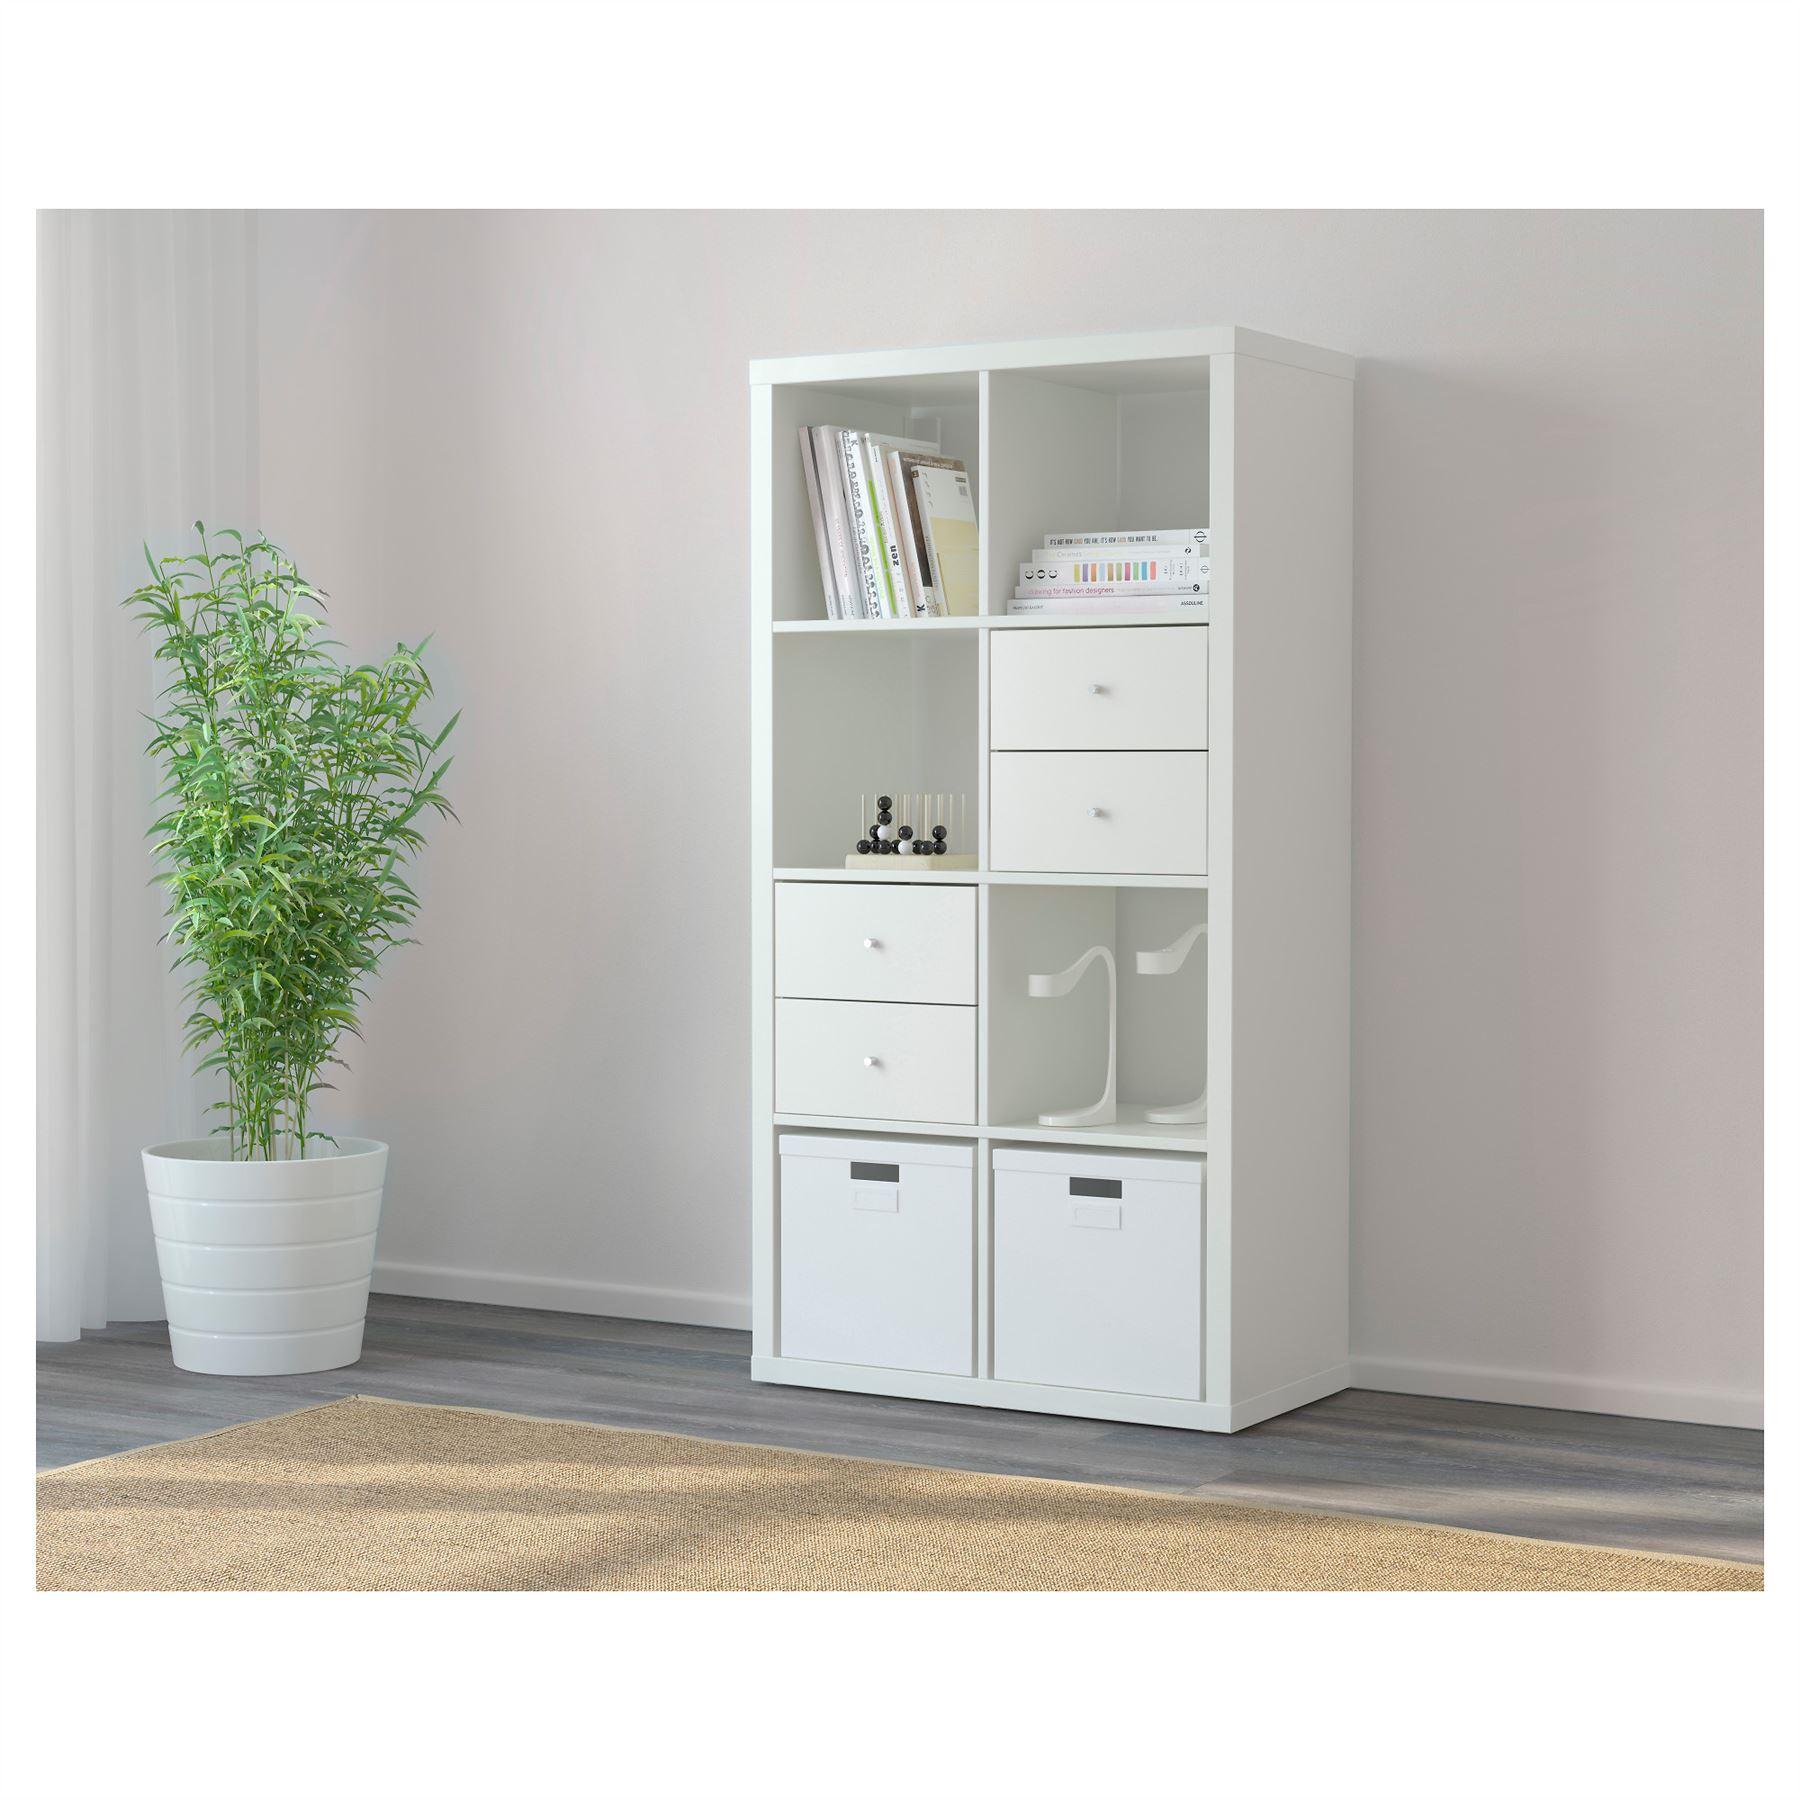 Ikea kallax 8 cube storage bookcase rectangle shelving for Ikea shelf white